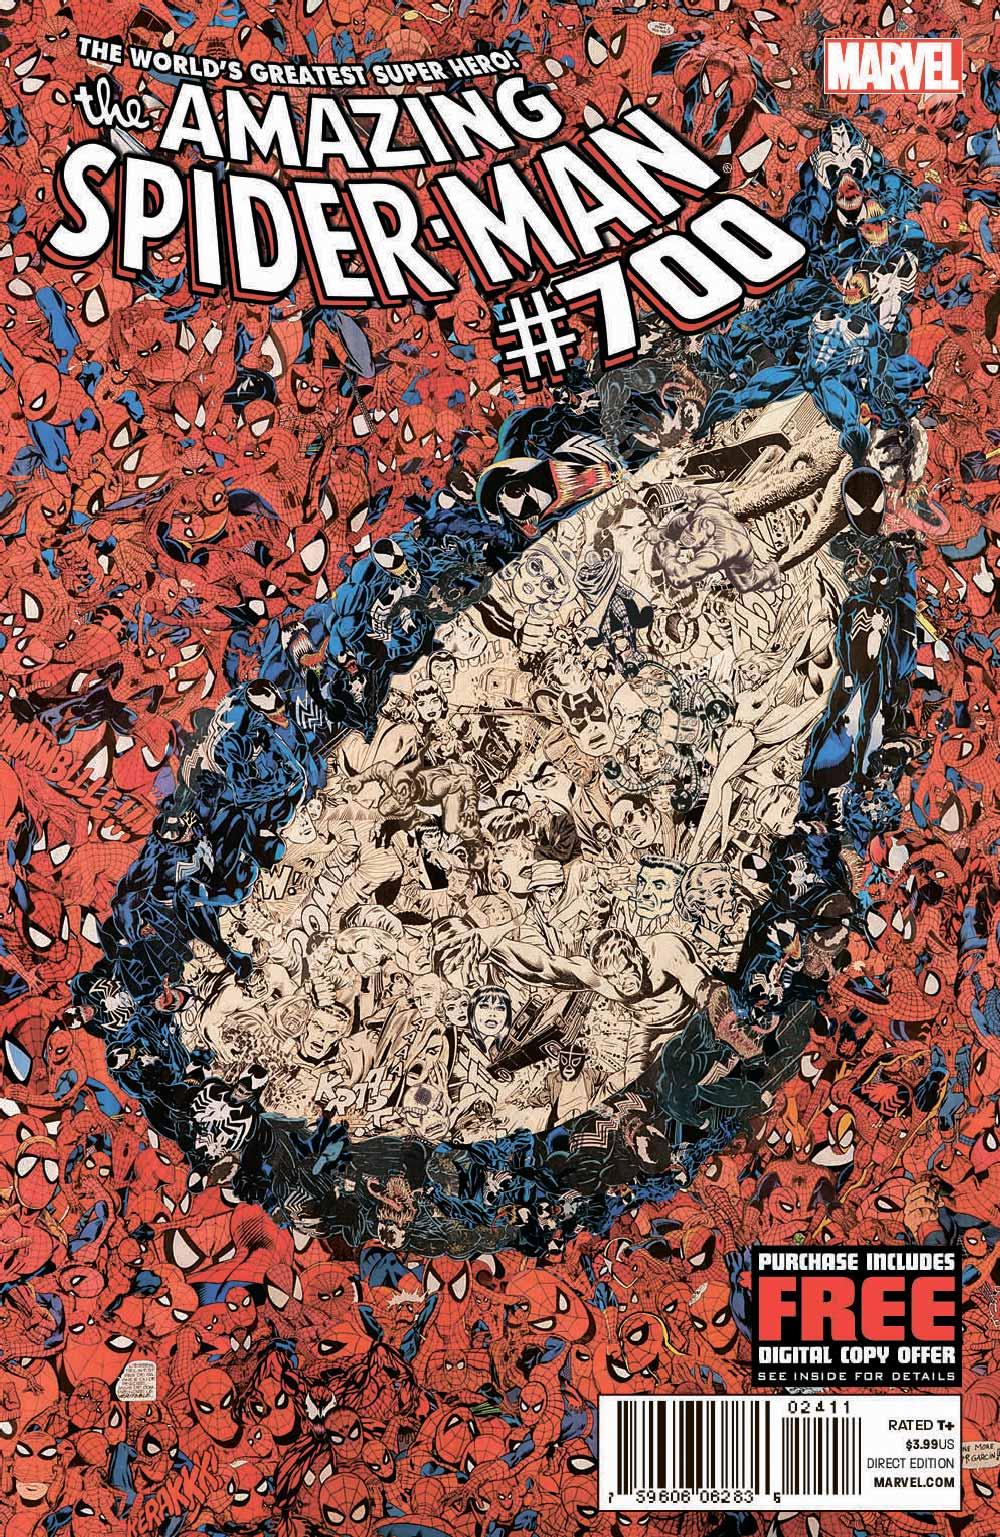 Marvel Comics,Amazing Spider-Man, комікси на українській, комікси марвел